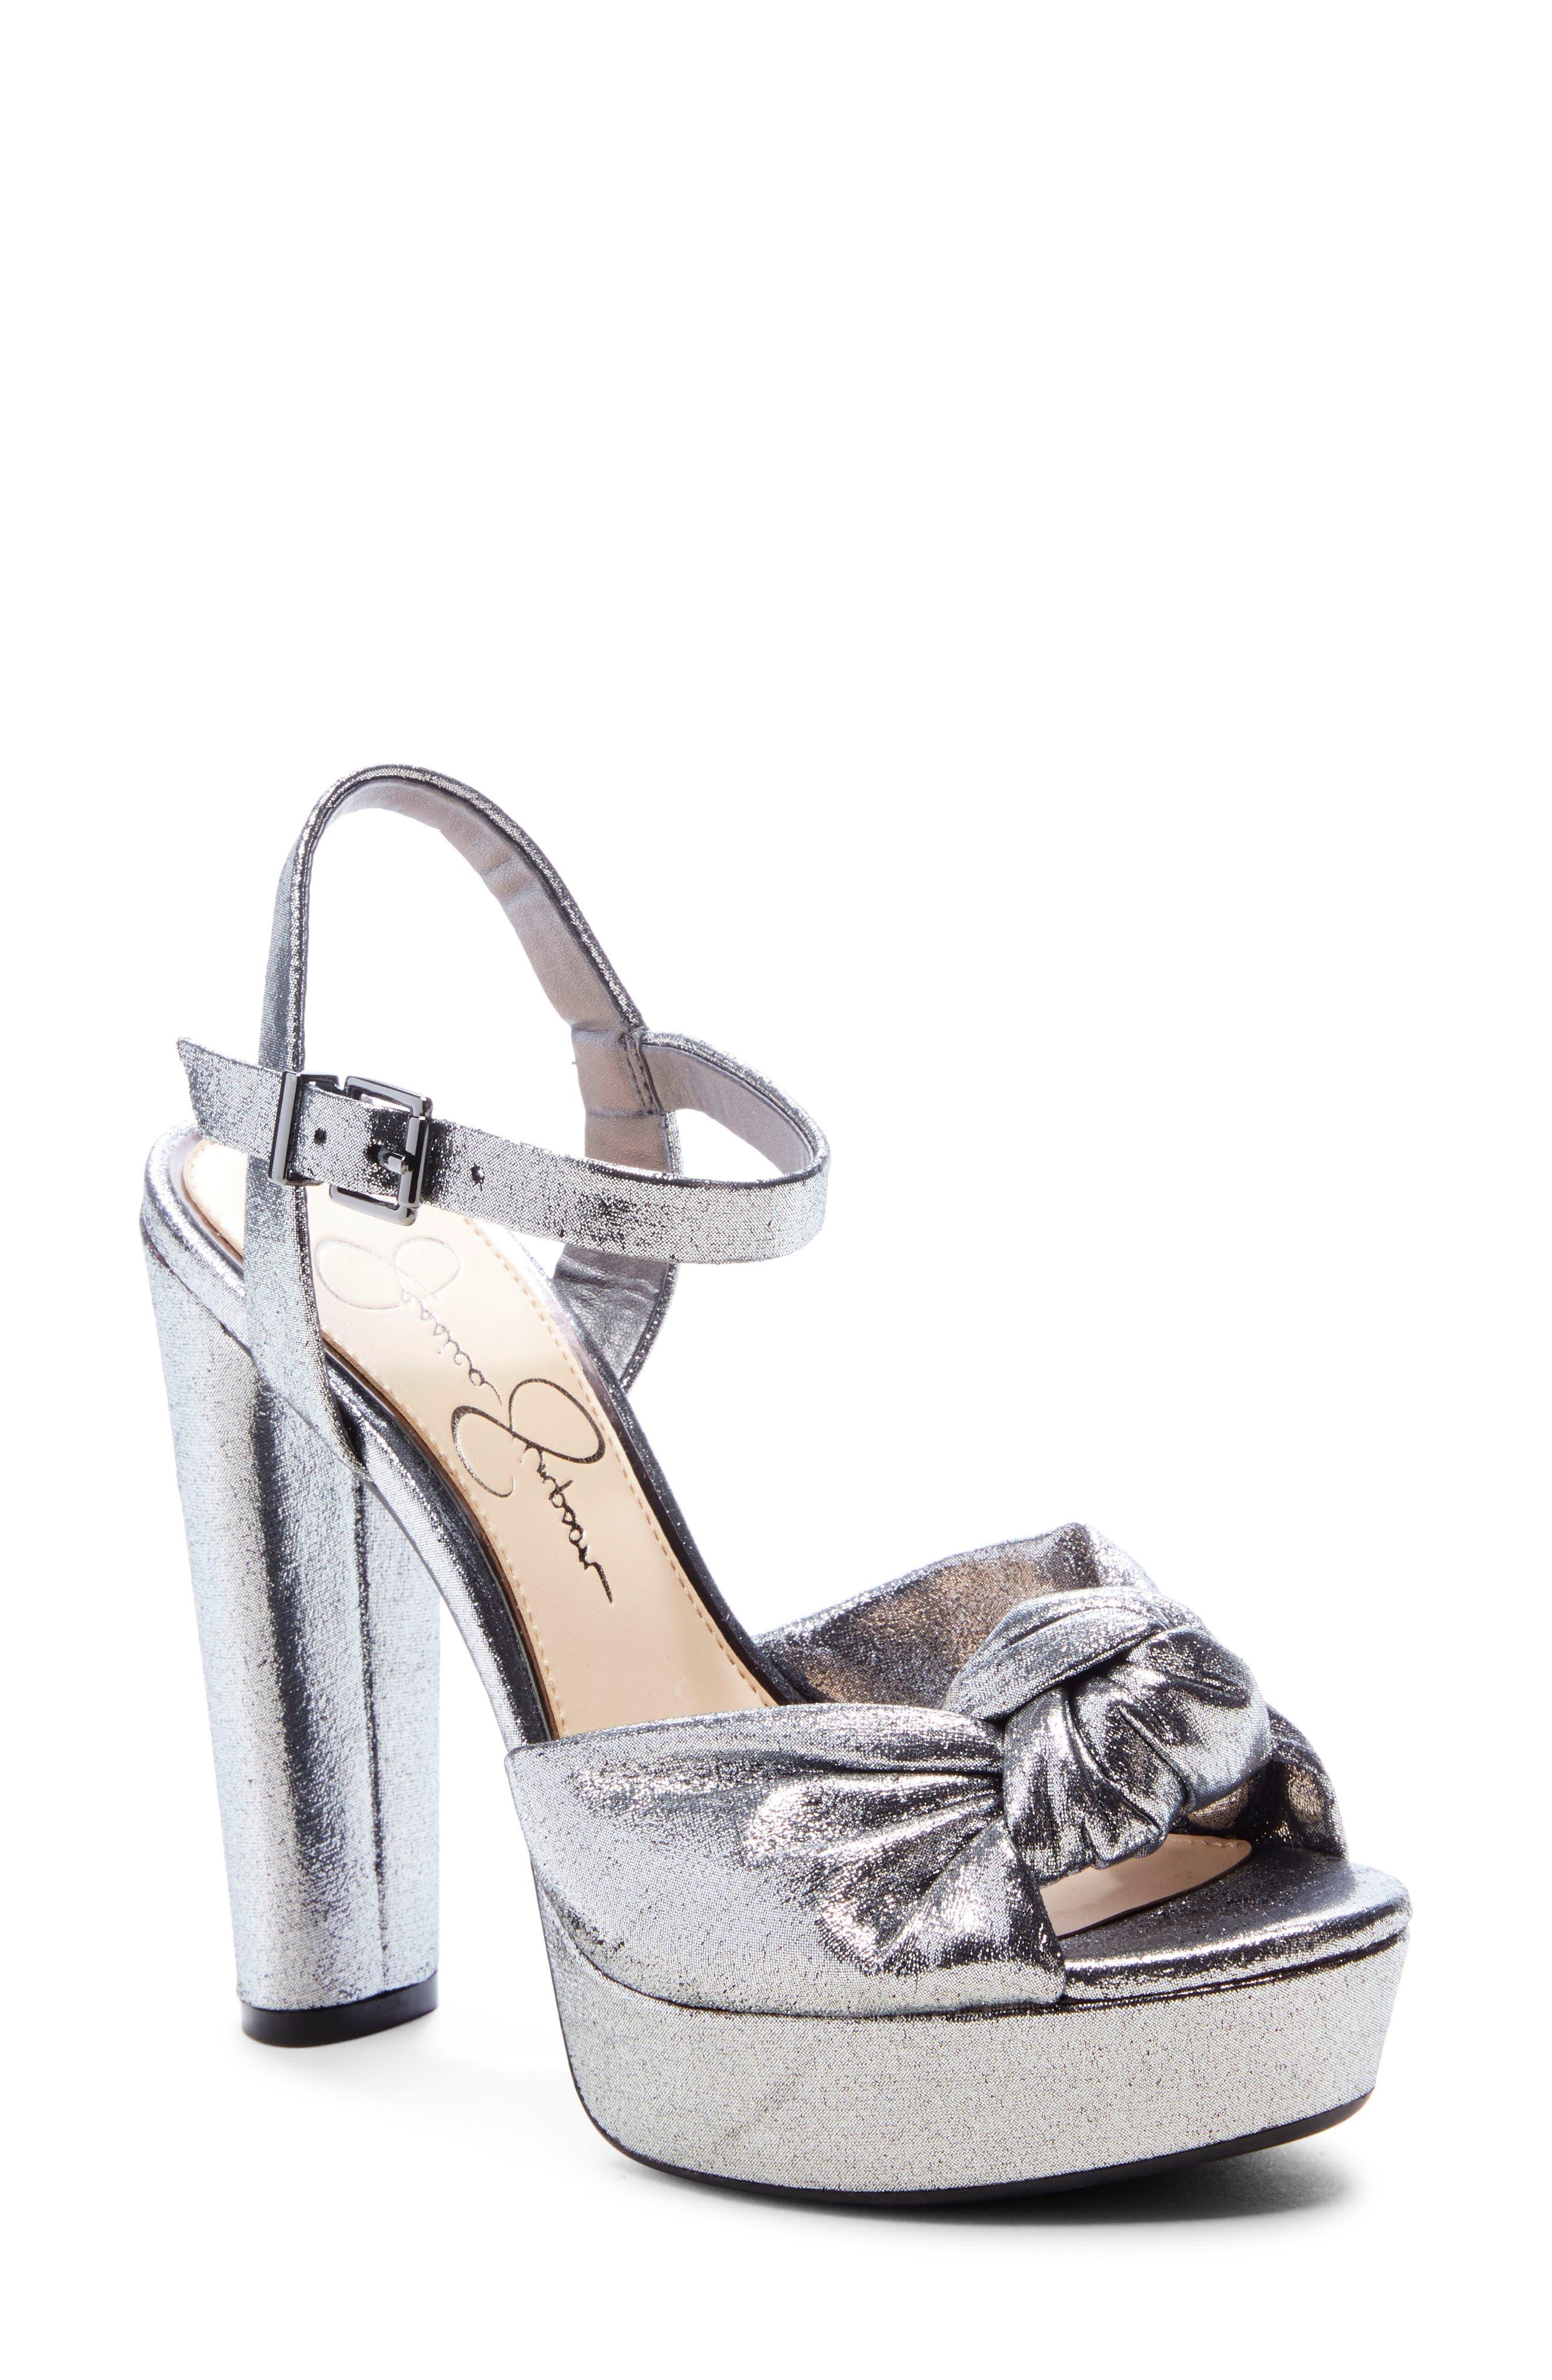 Jessica Simpson Ivrey Knot Platform Sandal, Grey